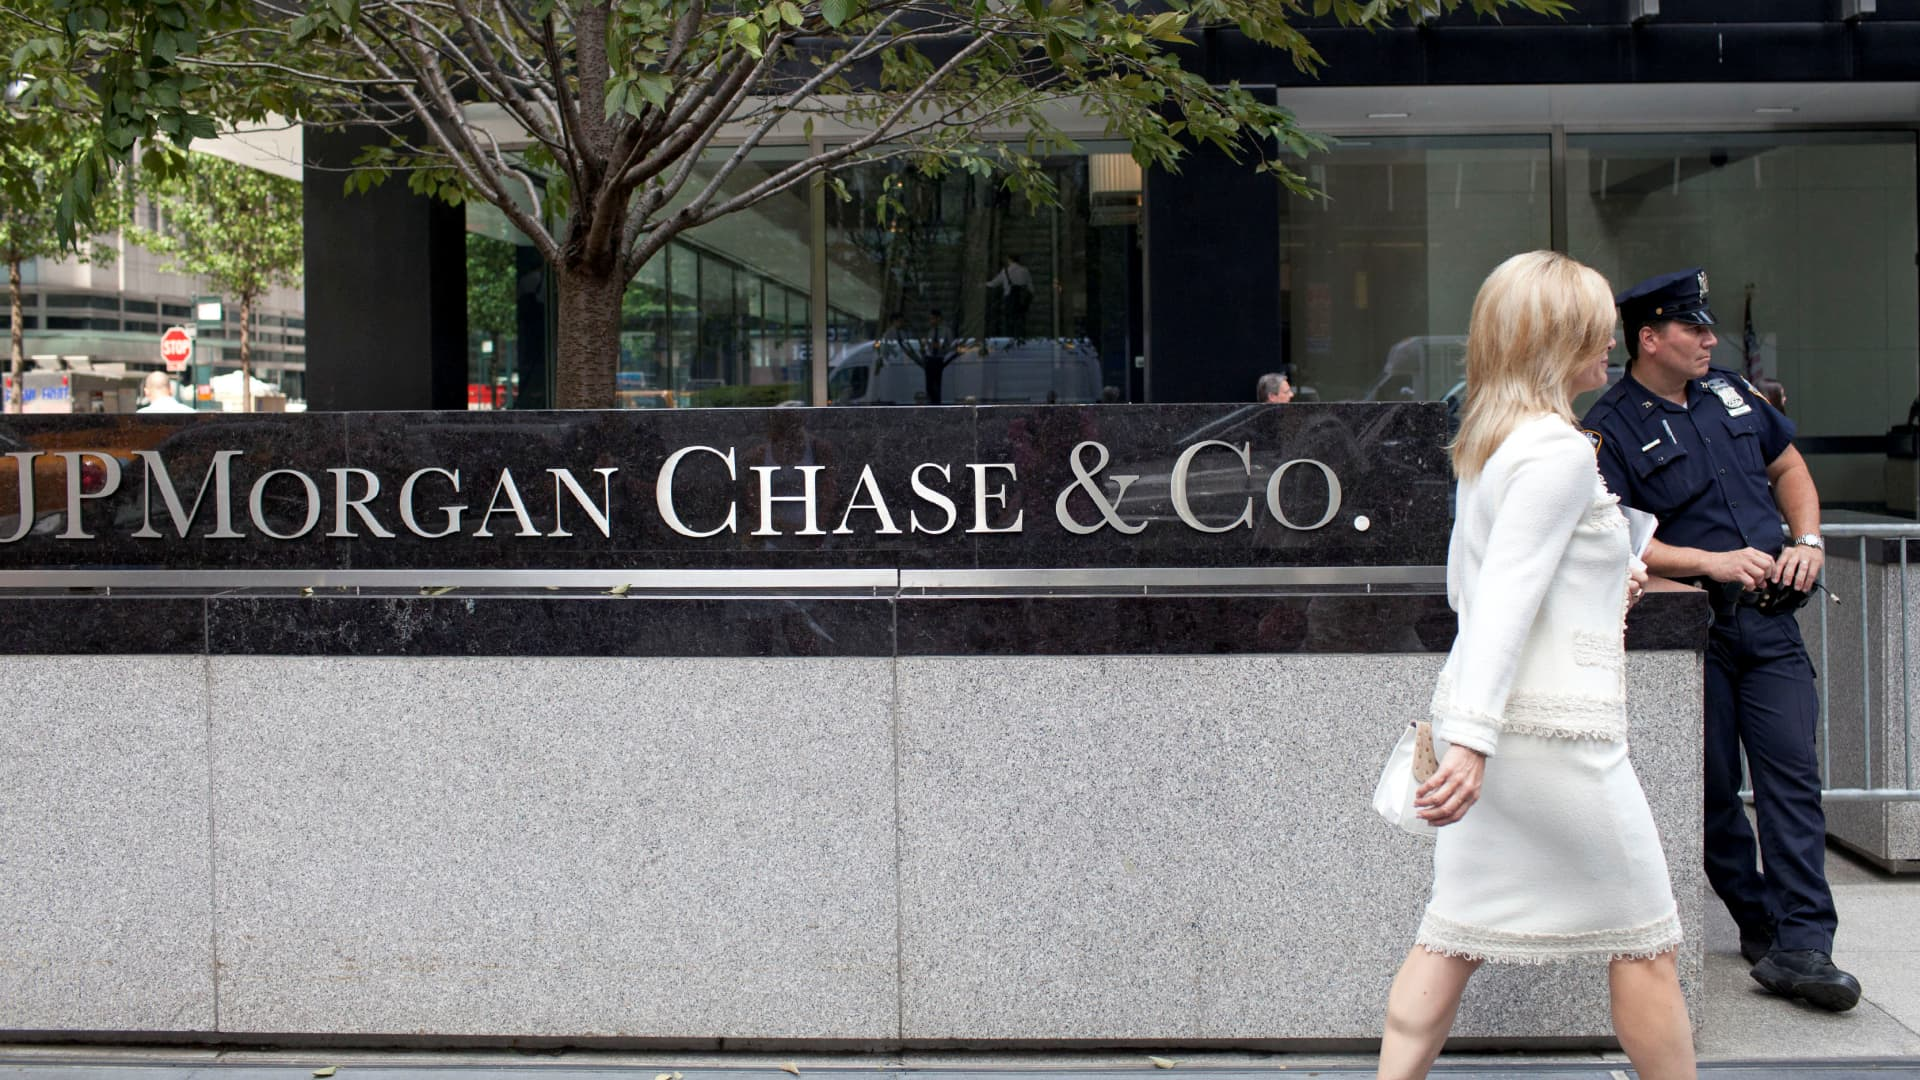 A woman walks past JPMorgan Chase & Co's international headquarters on Park Avenue in New York.